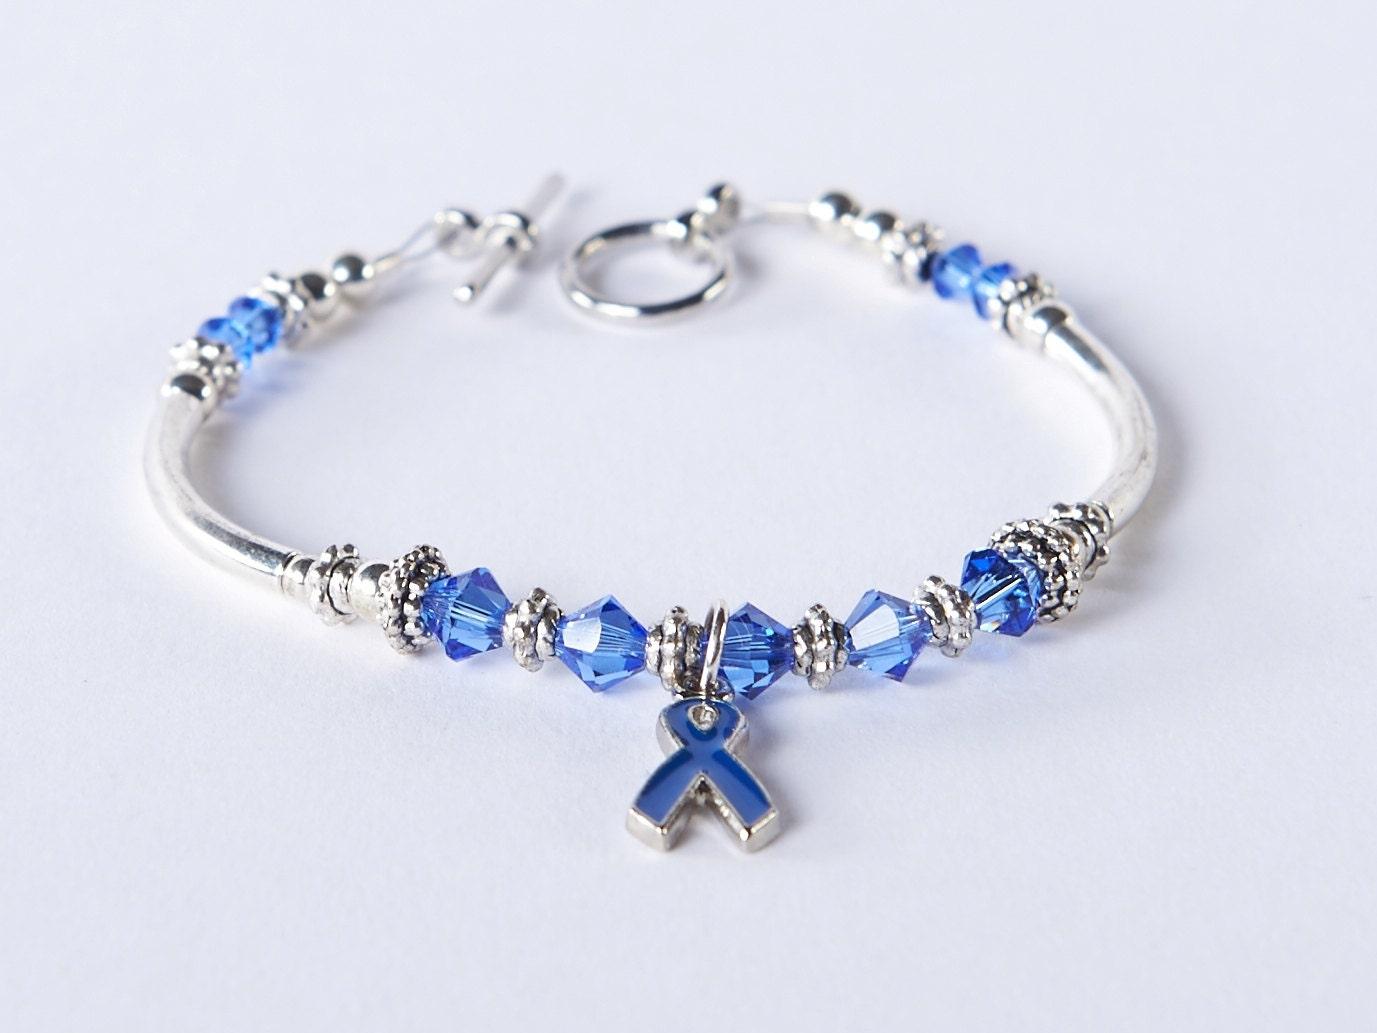 colon cancer cancer awareness bracelet 9 by silveradojewelry